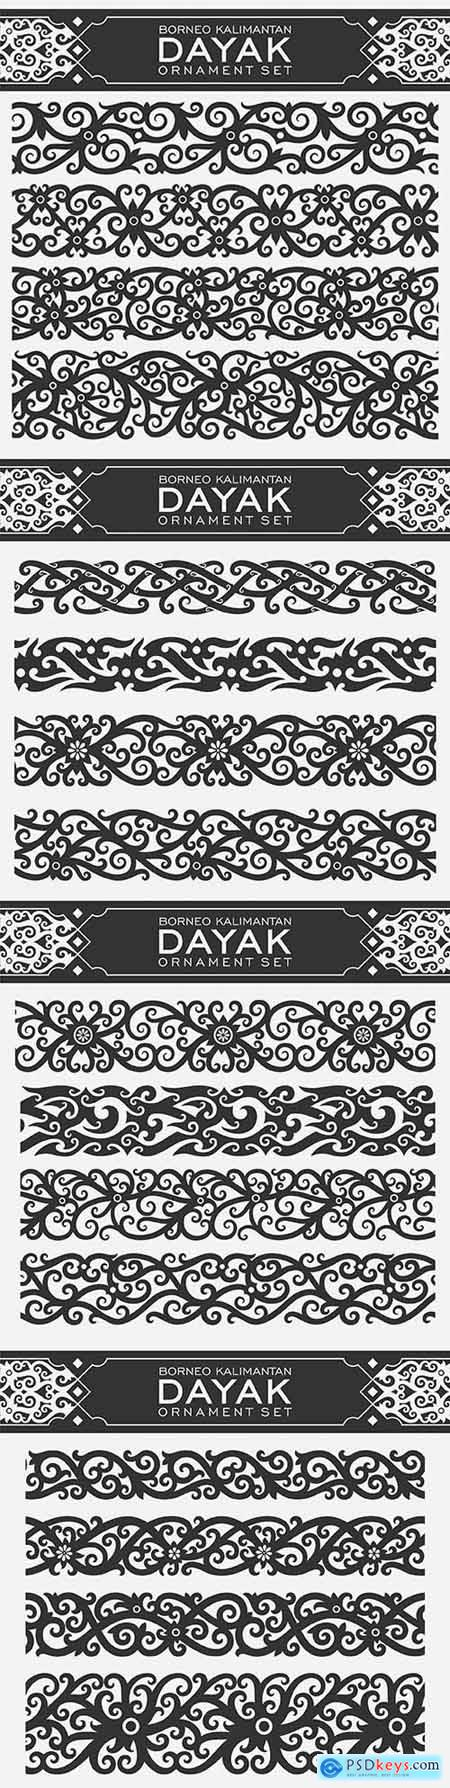 Borneo Kalimantan Dayak ornament set illustration design